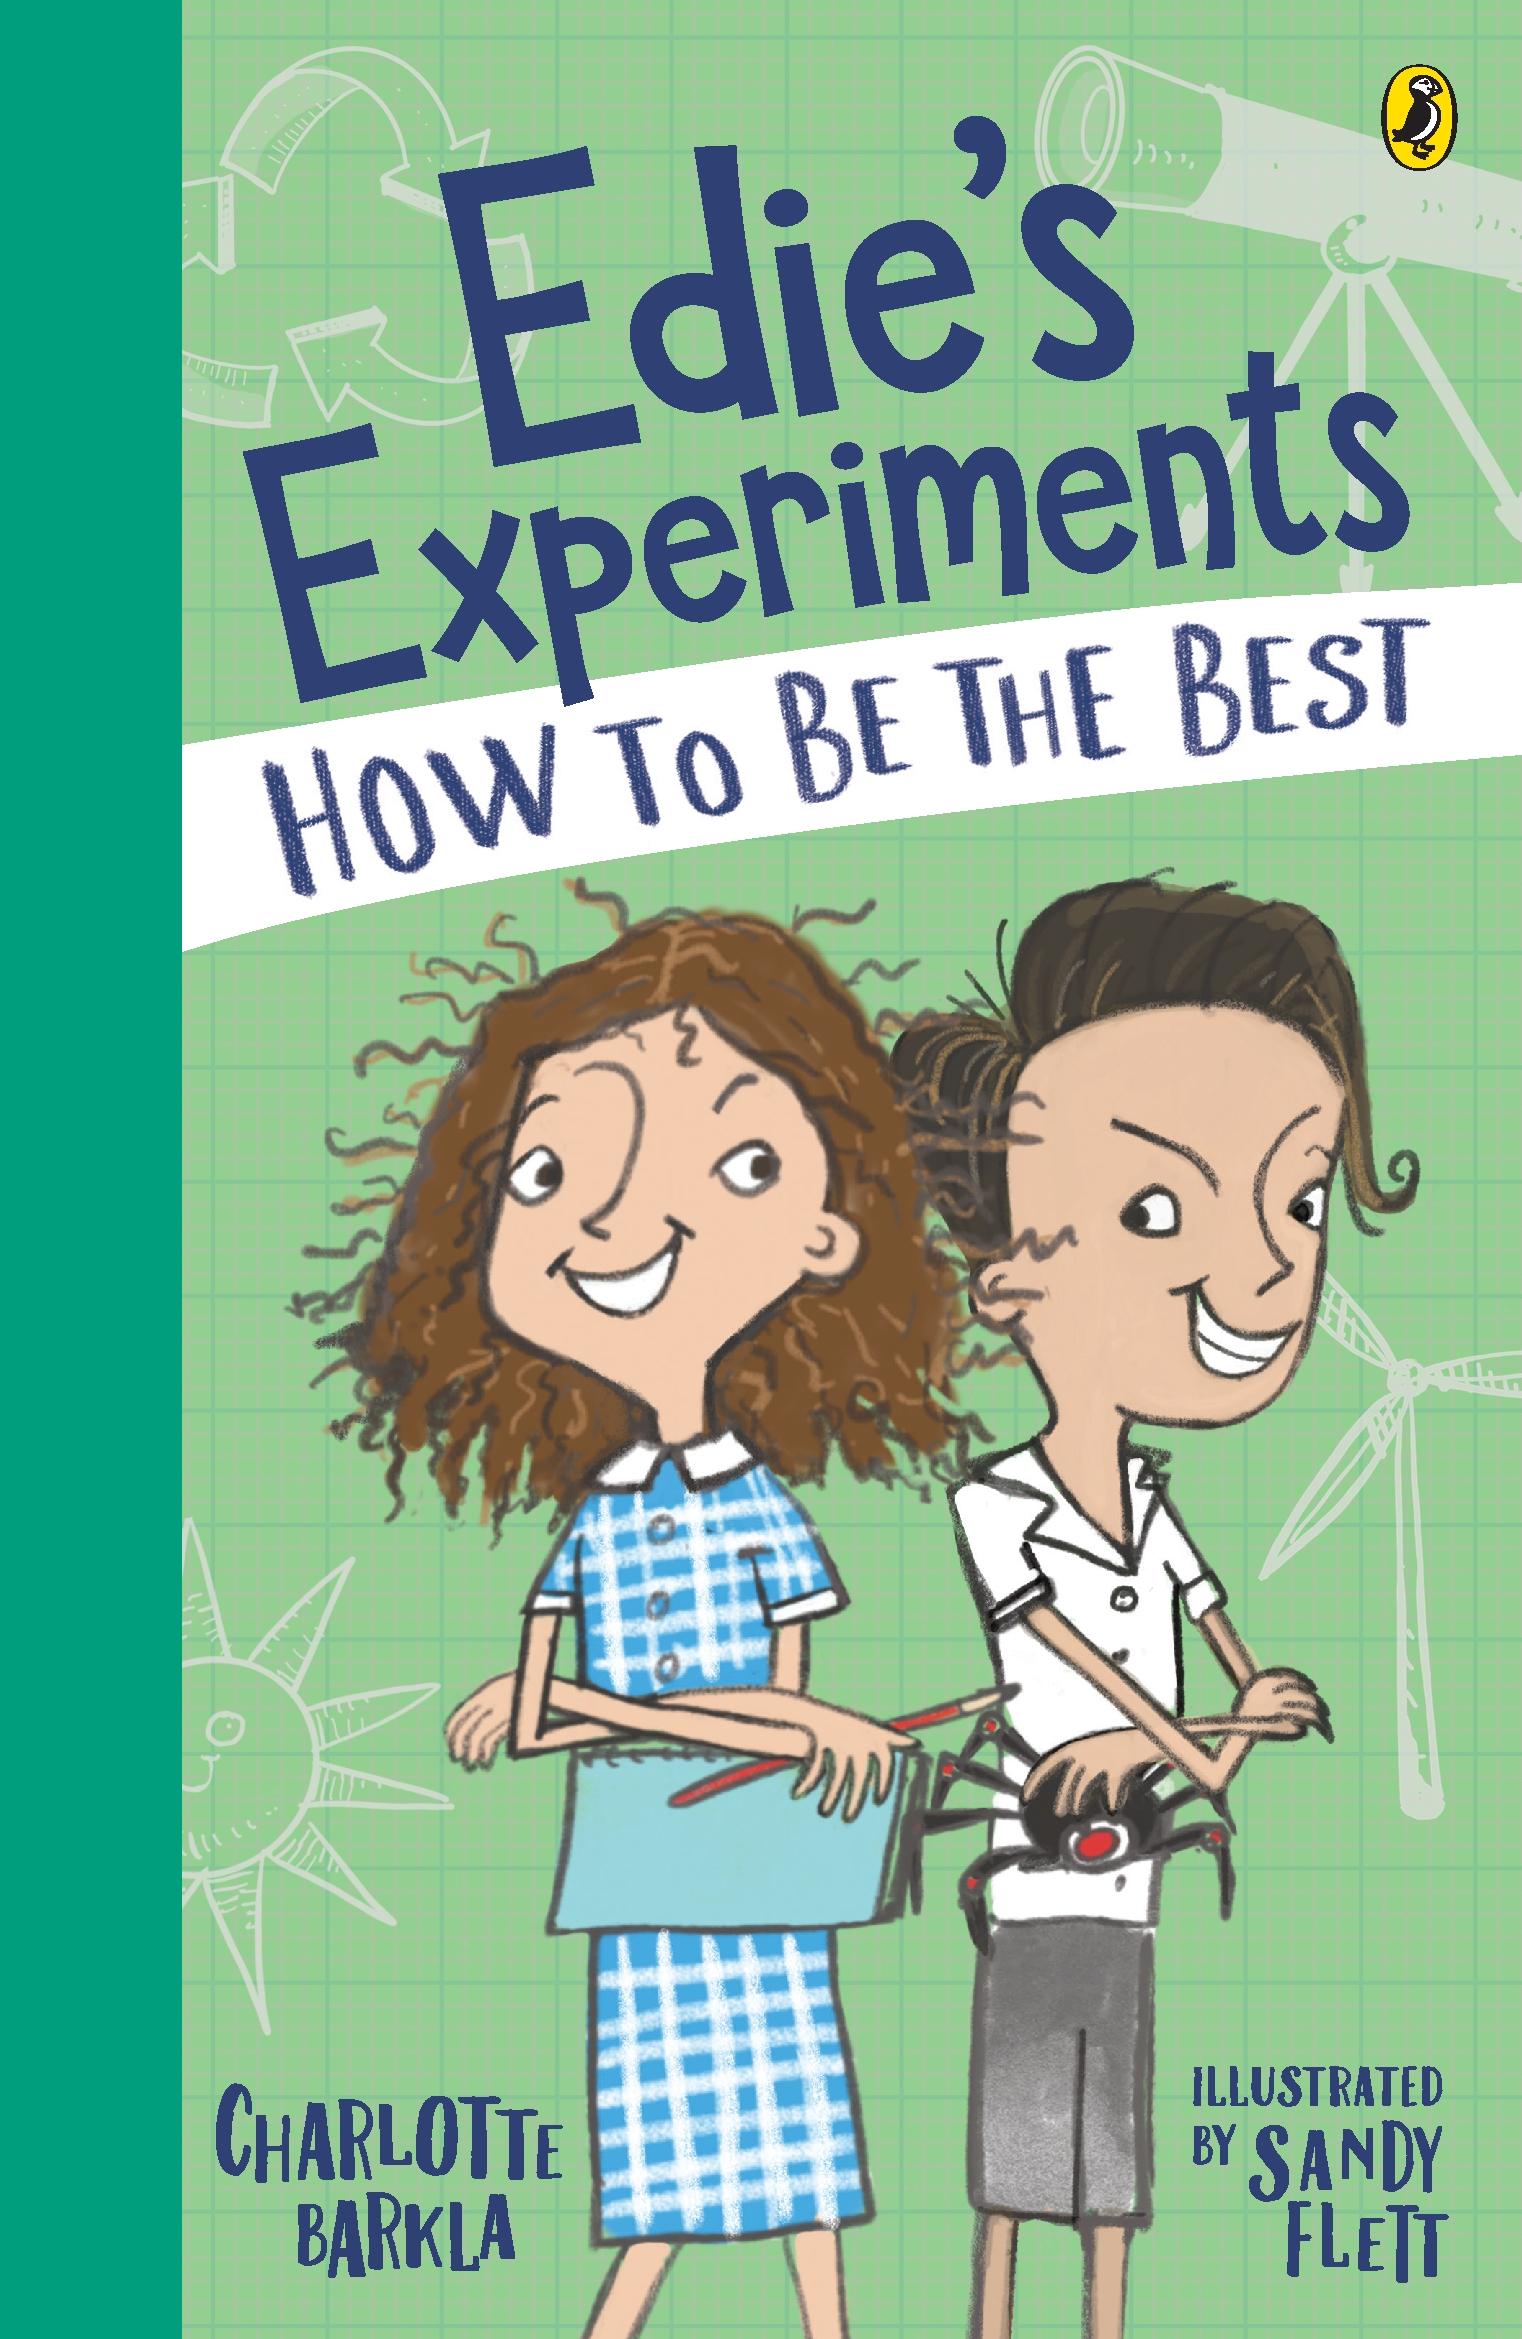 Edies Experiments 2